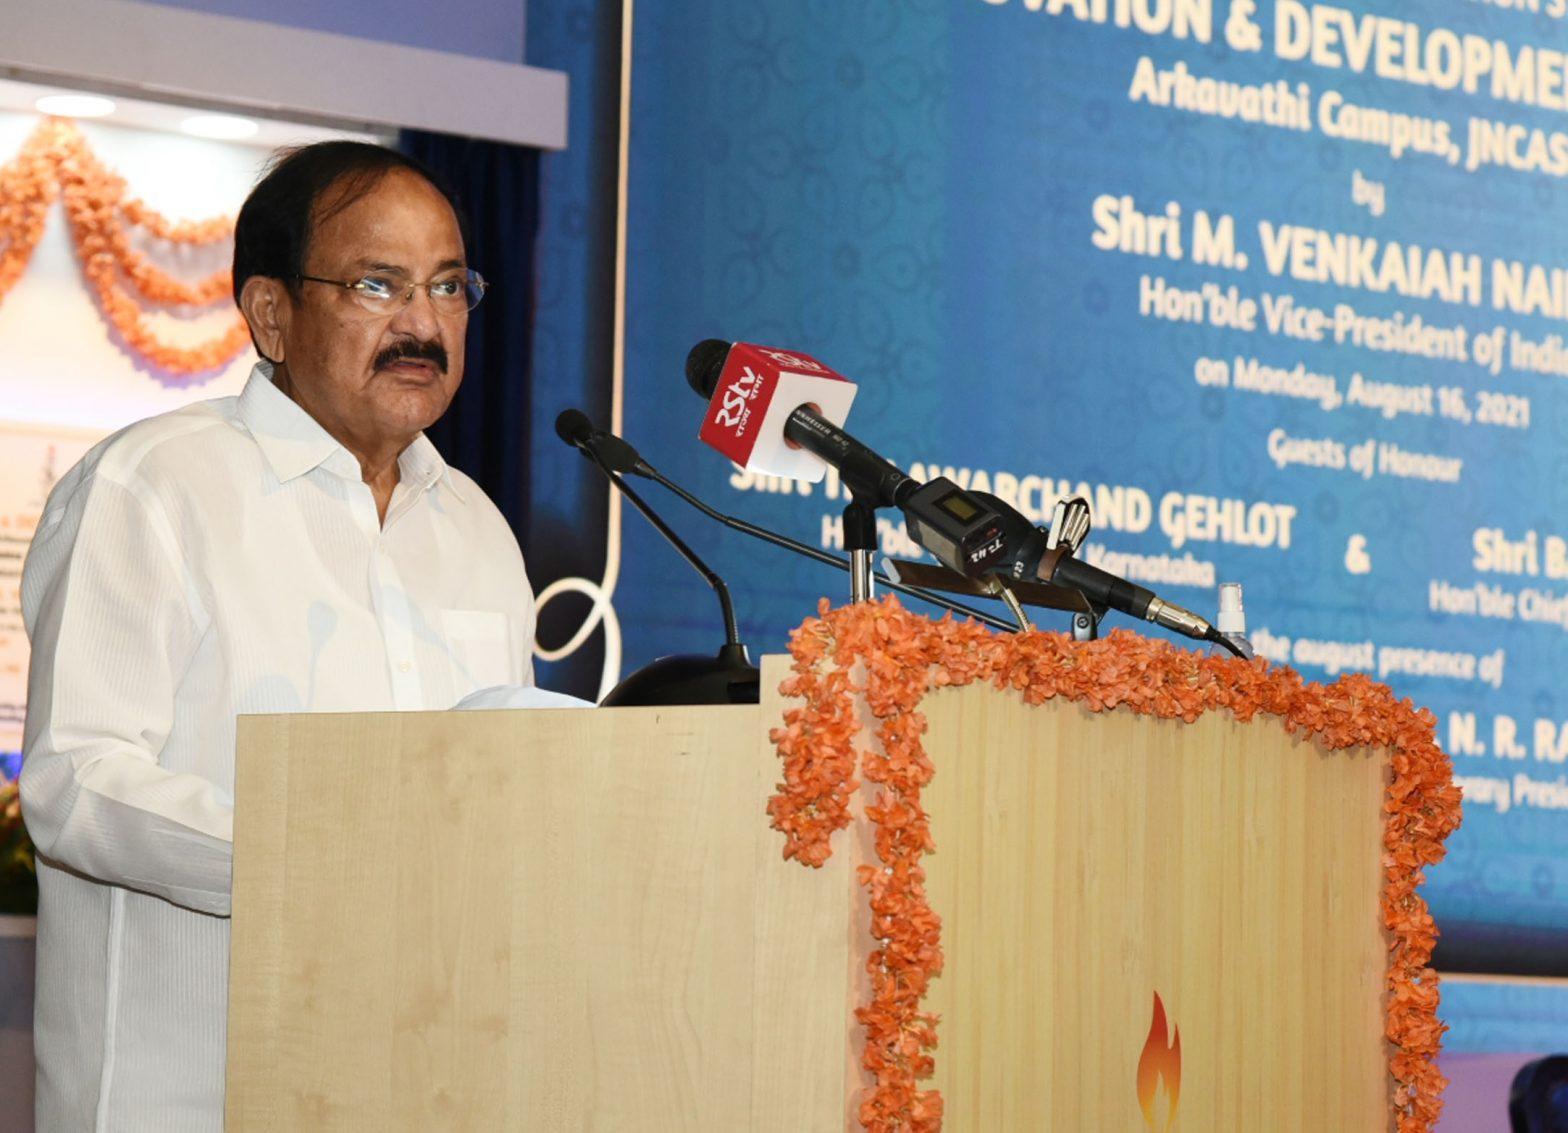 Venkaiah Naidu laid foundation stone of Innovation and Development Centre_40.1